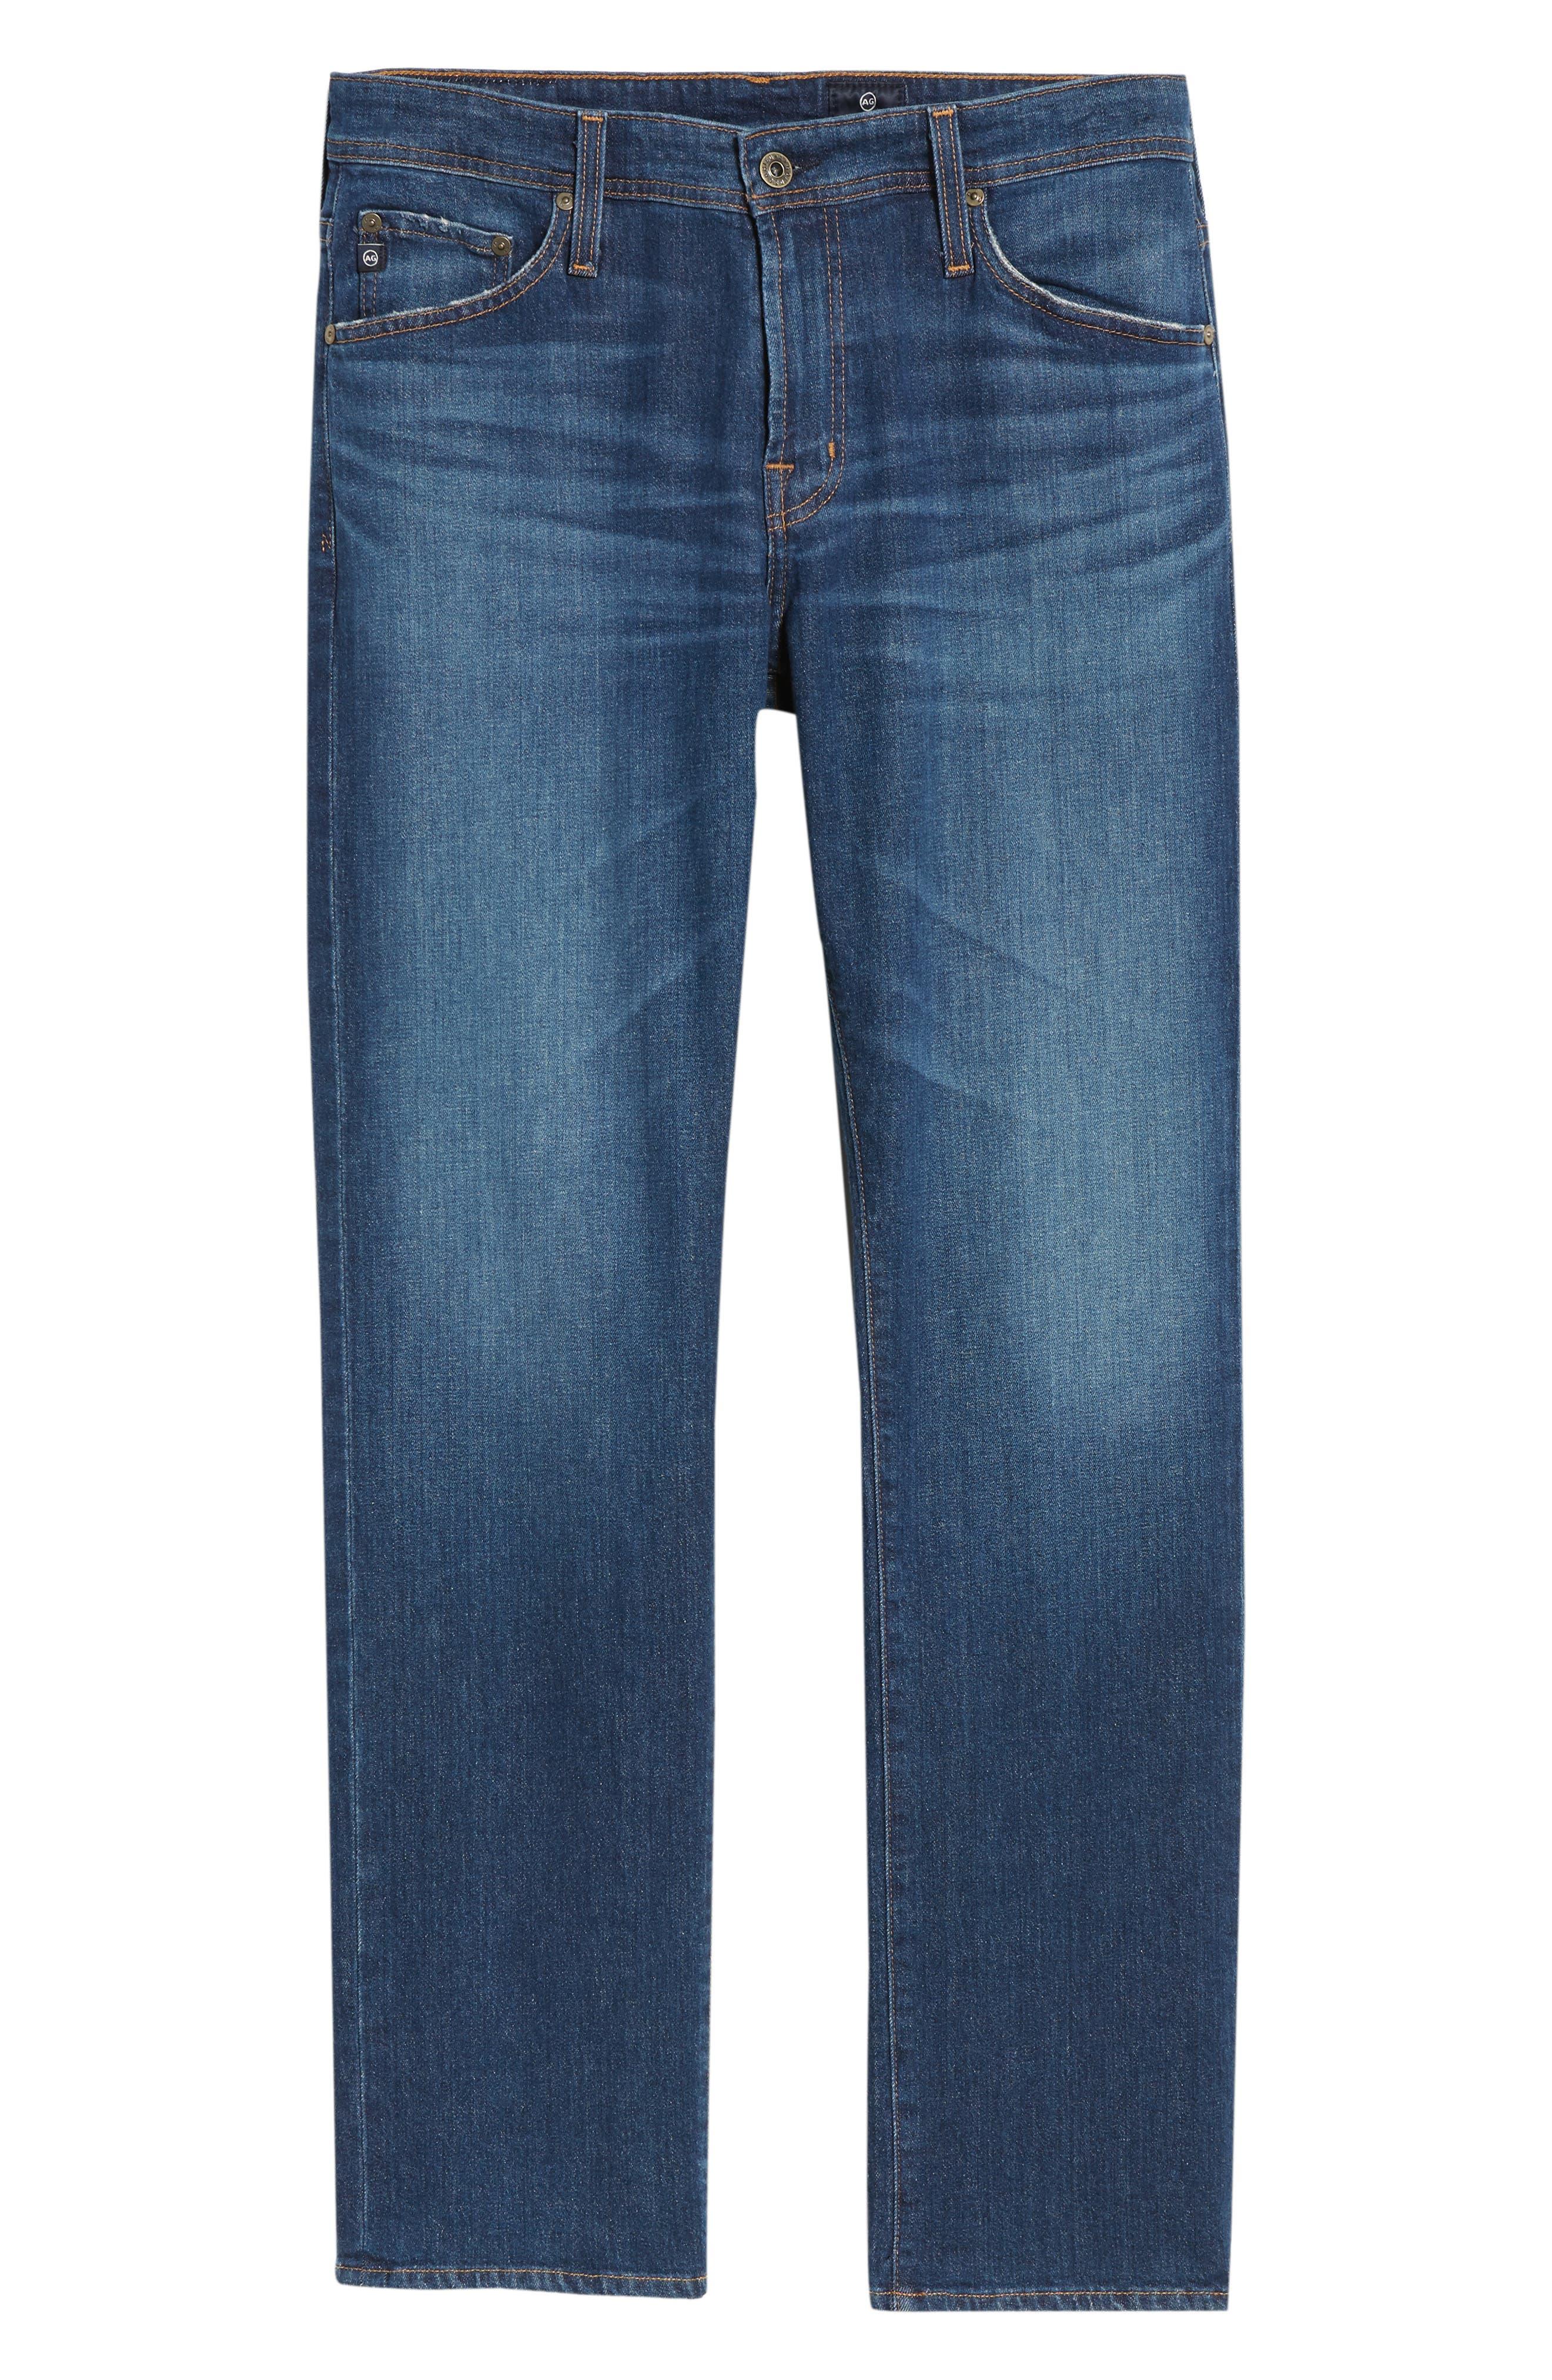 Graduate Slim Straight Leg Jeans,                             Alternate thumbnail 6, color,                             400